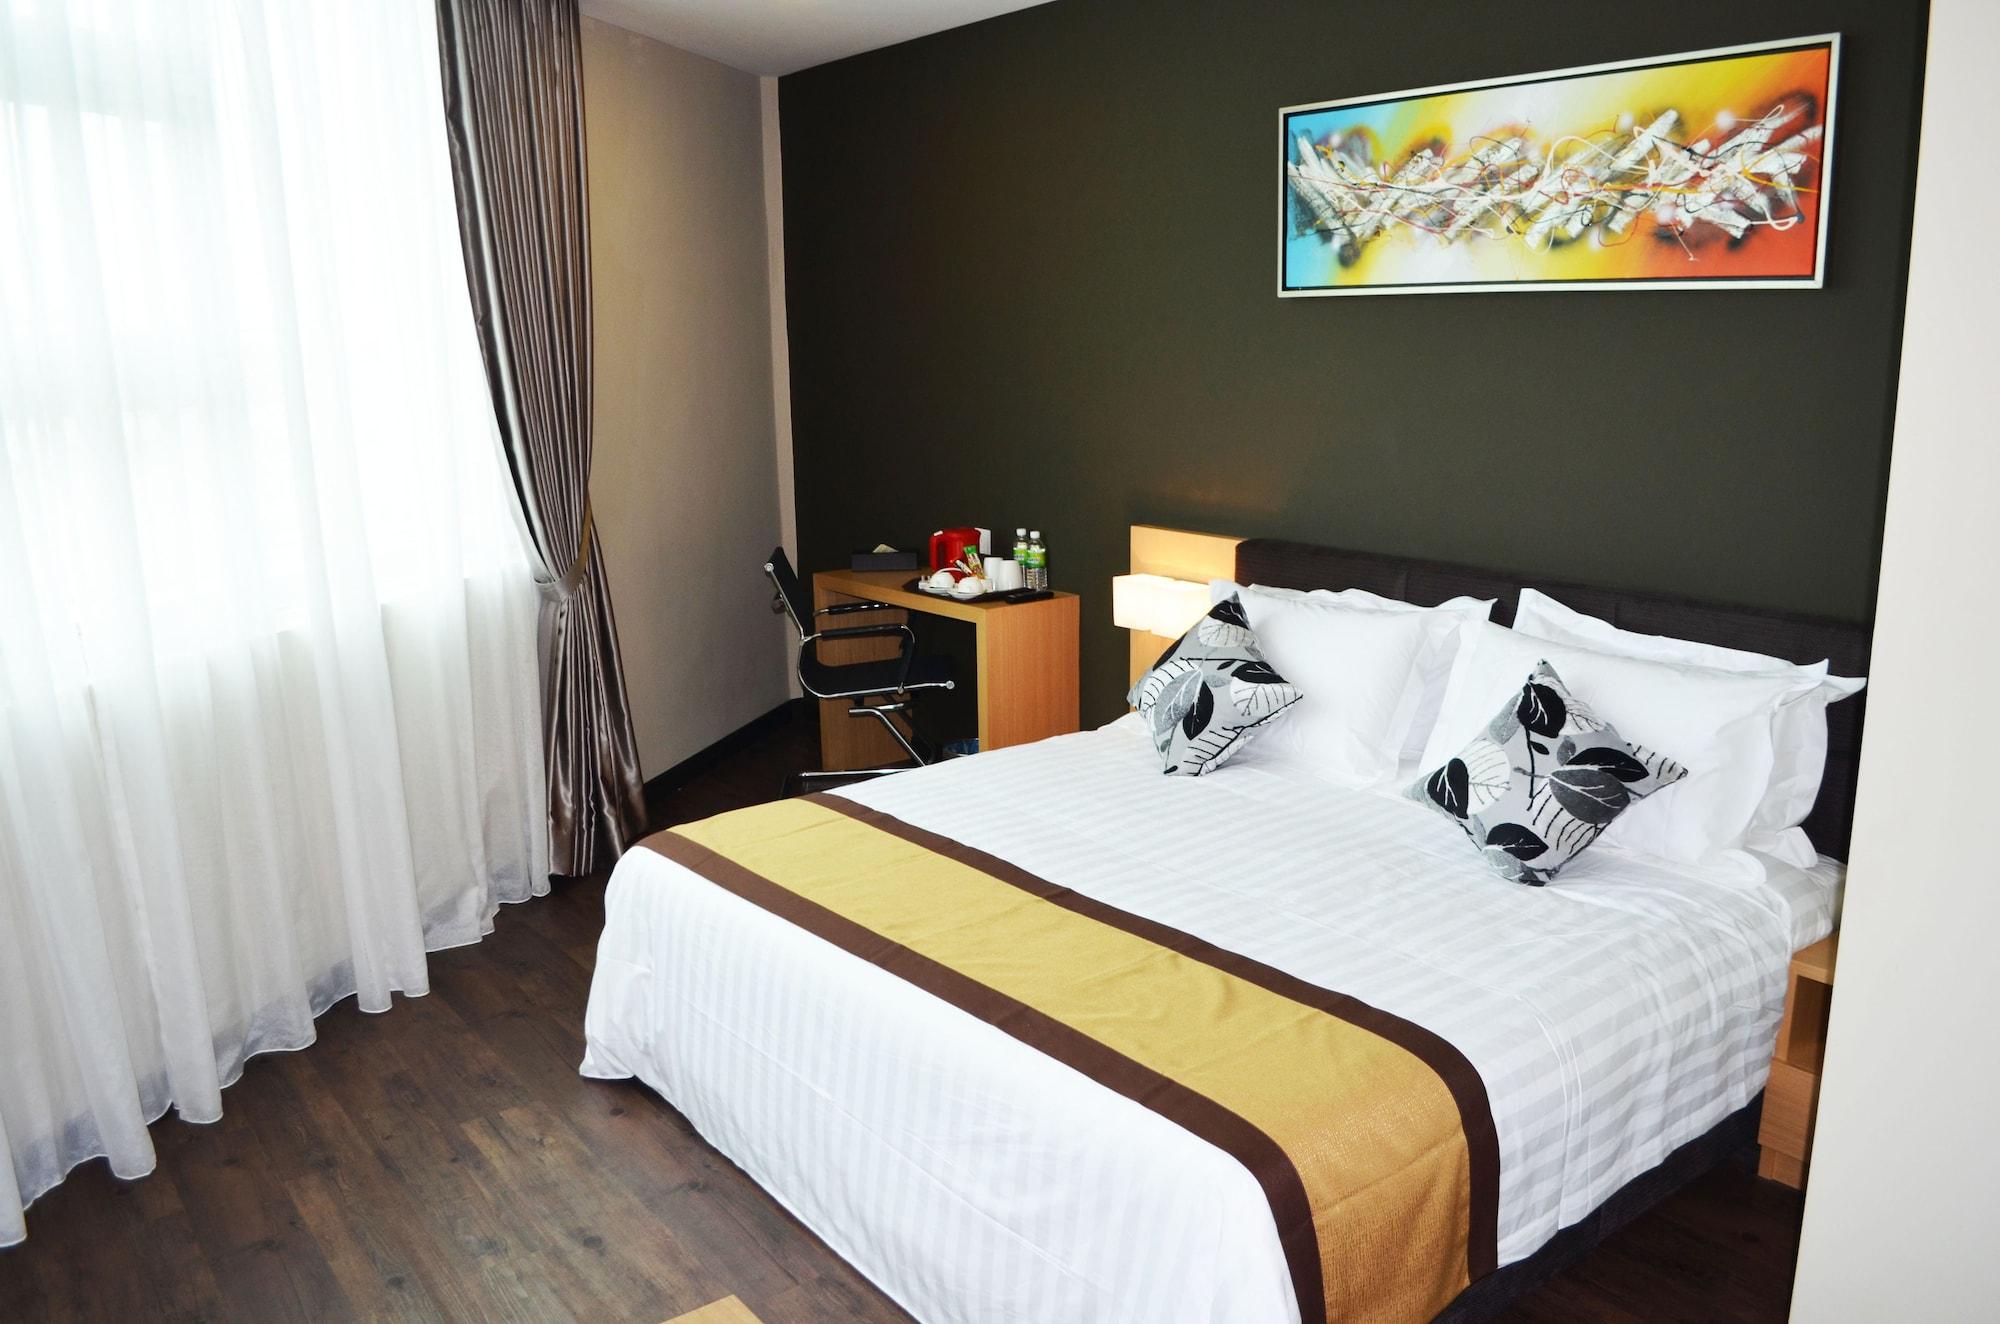 Q Bintang Hotel, Pokok Sena